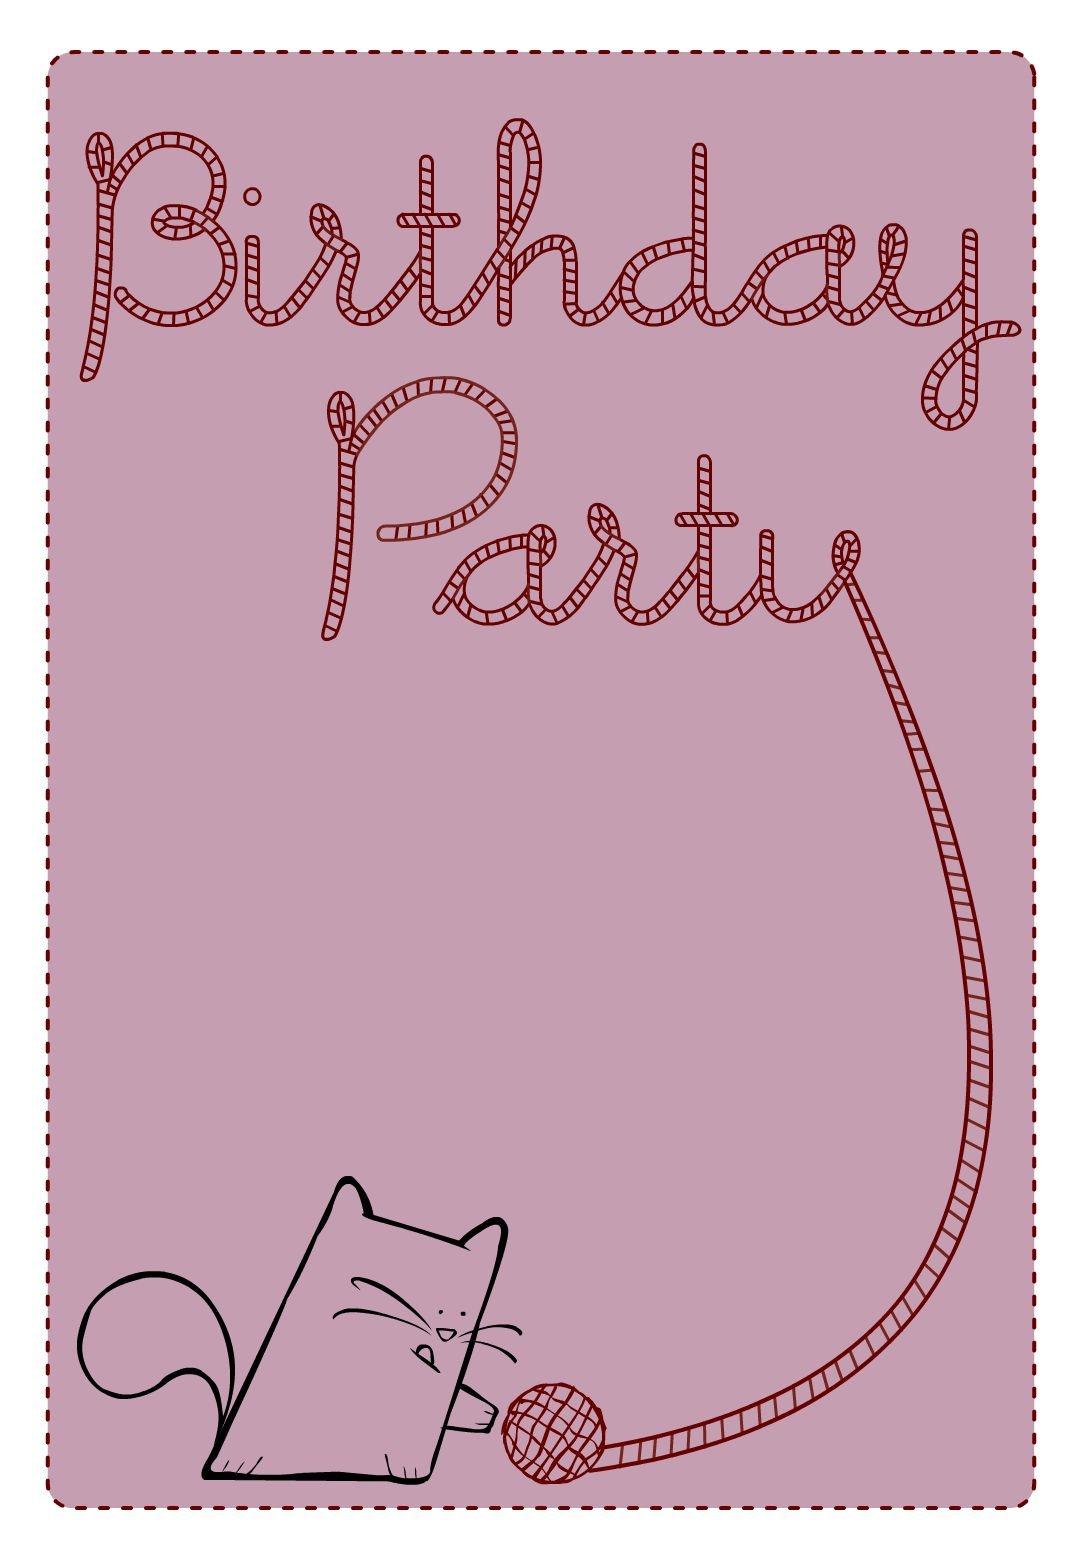 Free Printable Birthday Party Cat Invitation | Birthday Party Ideas - Free Printable Birthday Invitations Pinterest